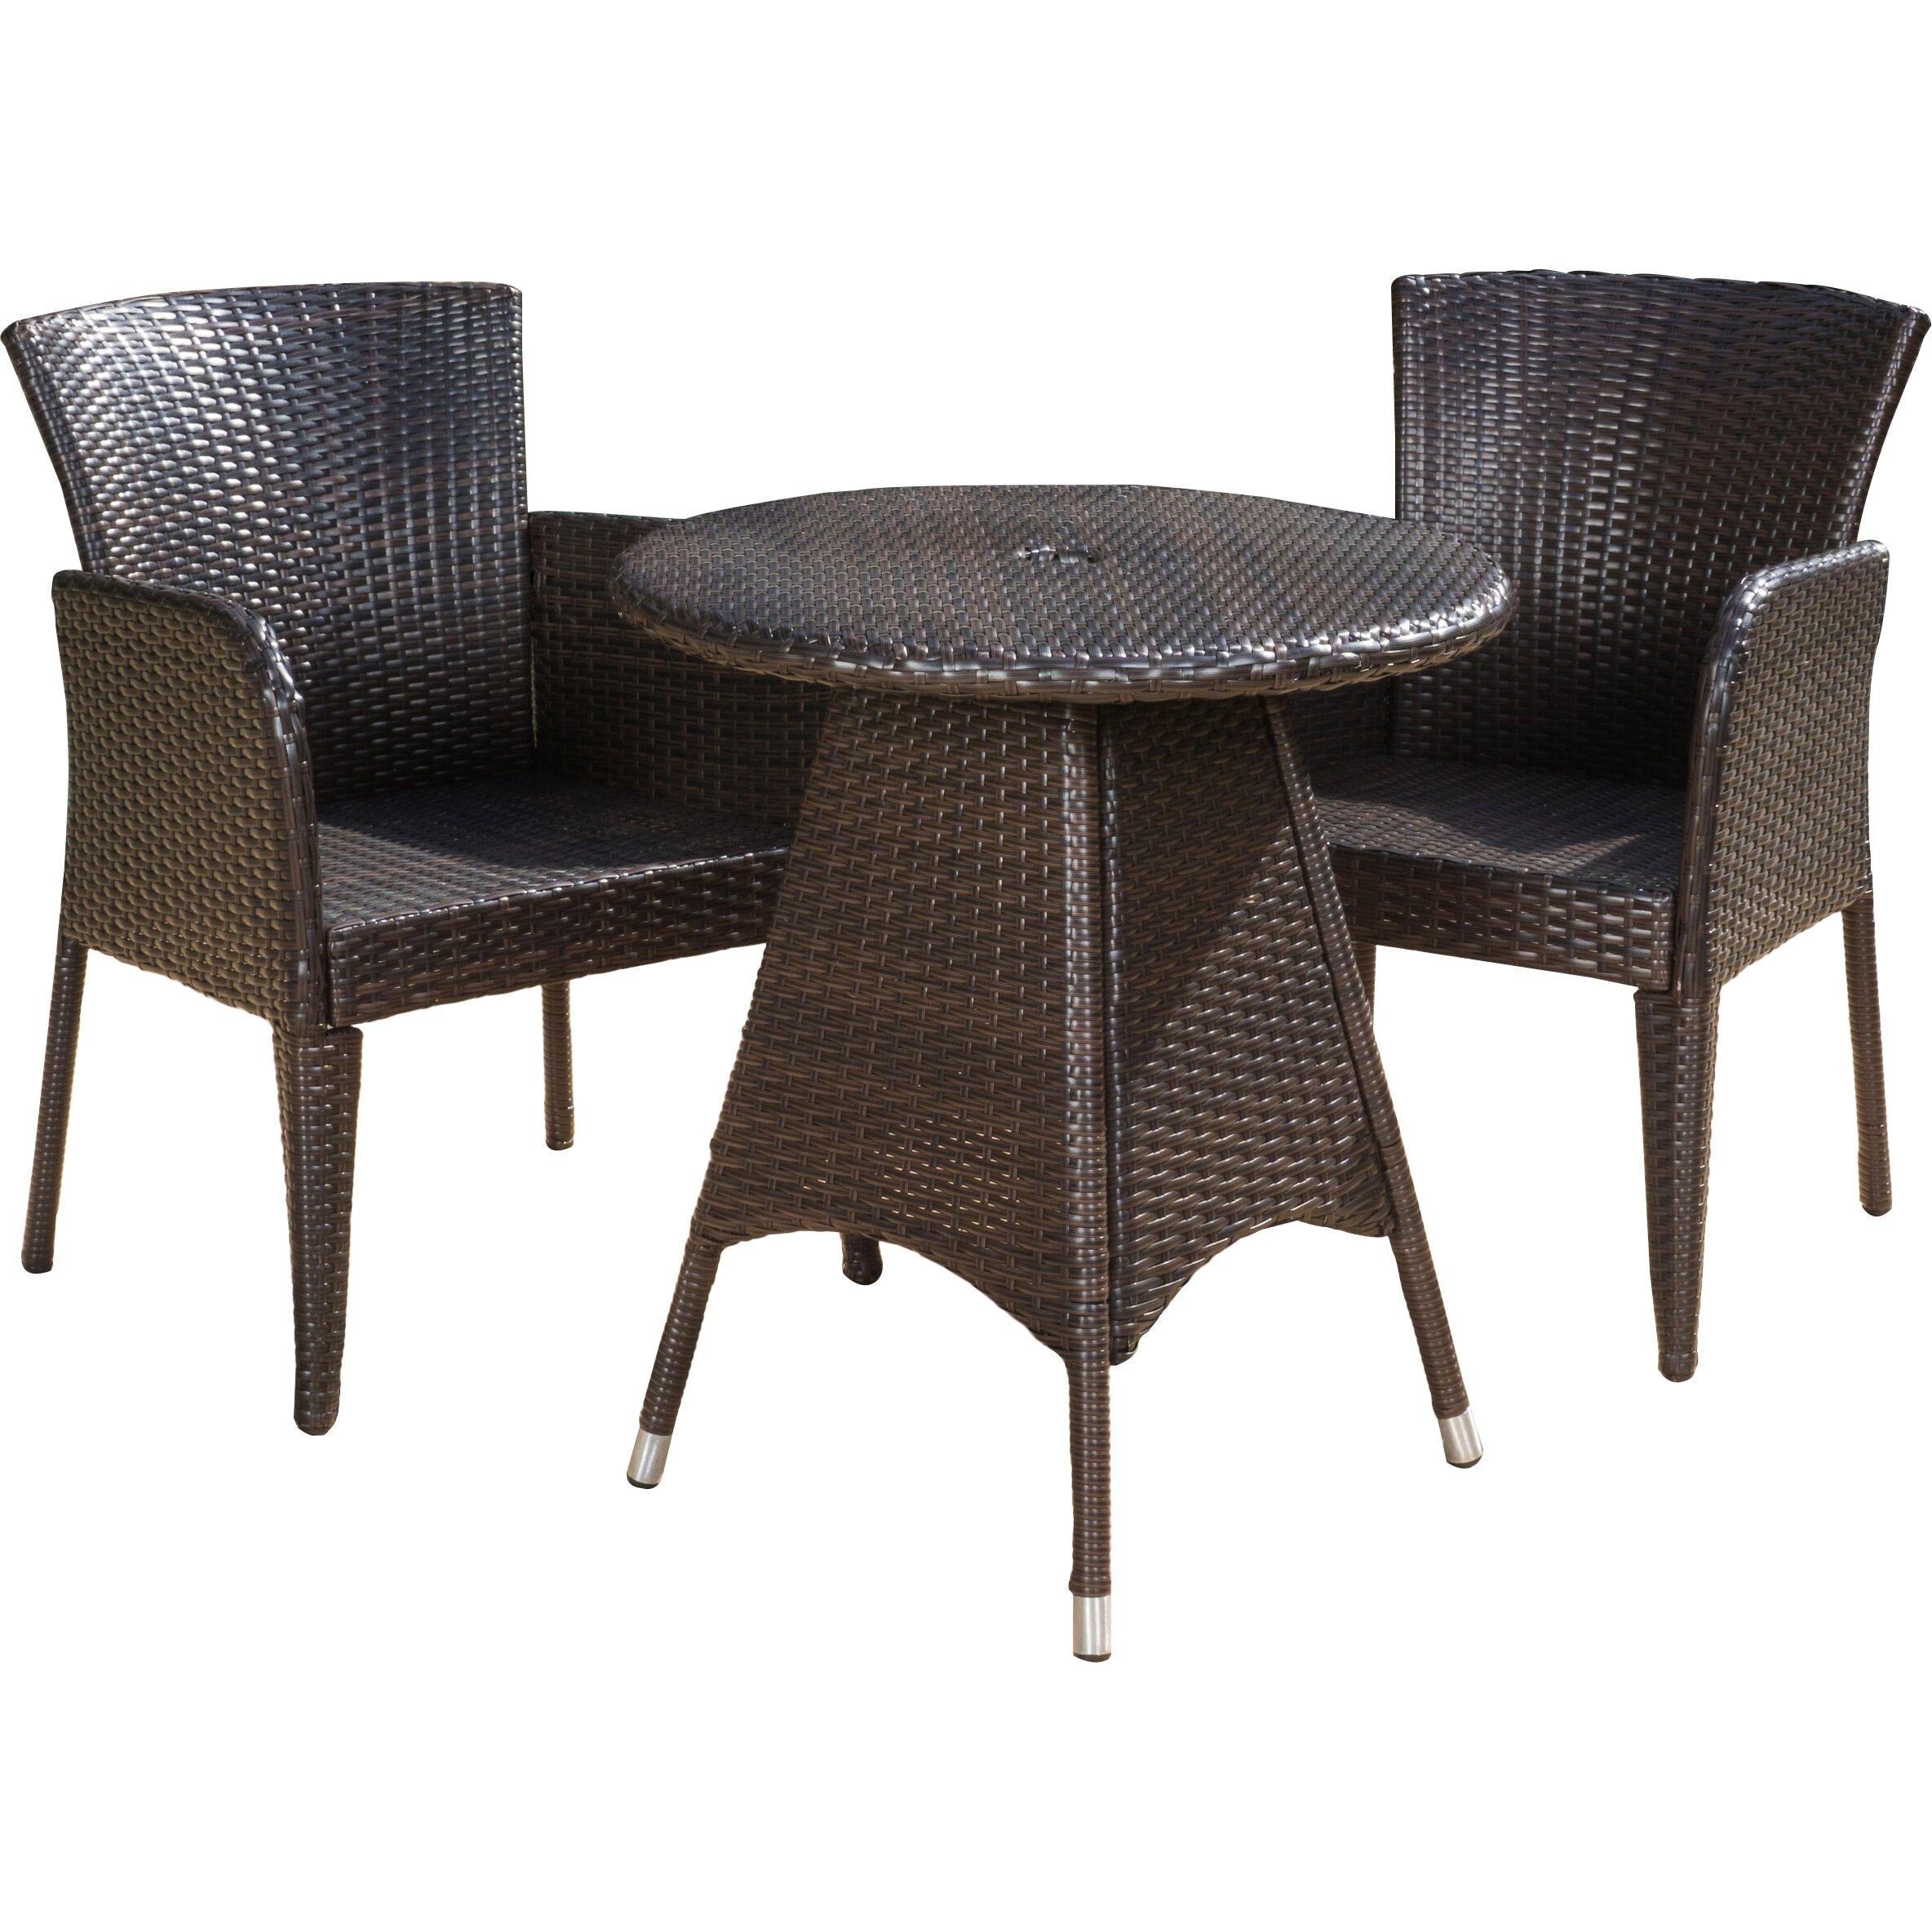 mercury row damianos 3 piece dining set reviews wayfair. Black Bedroom Furniture Sets. Home Design Ideas